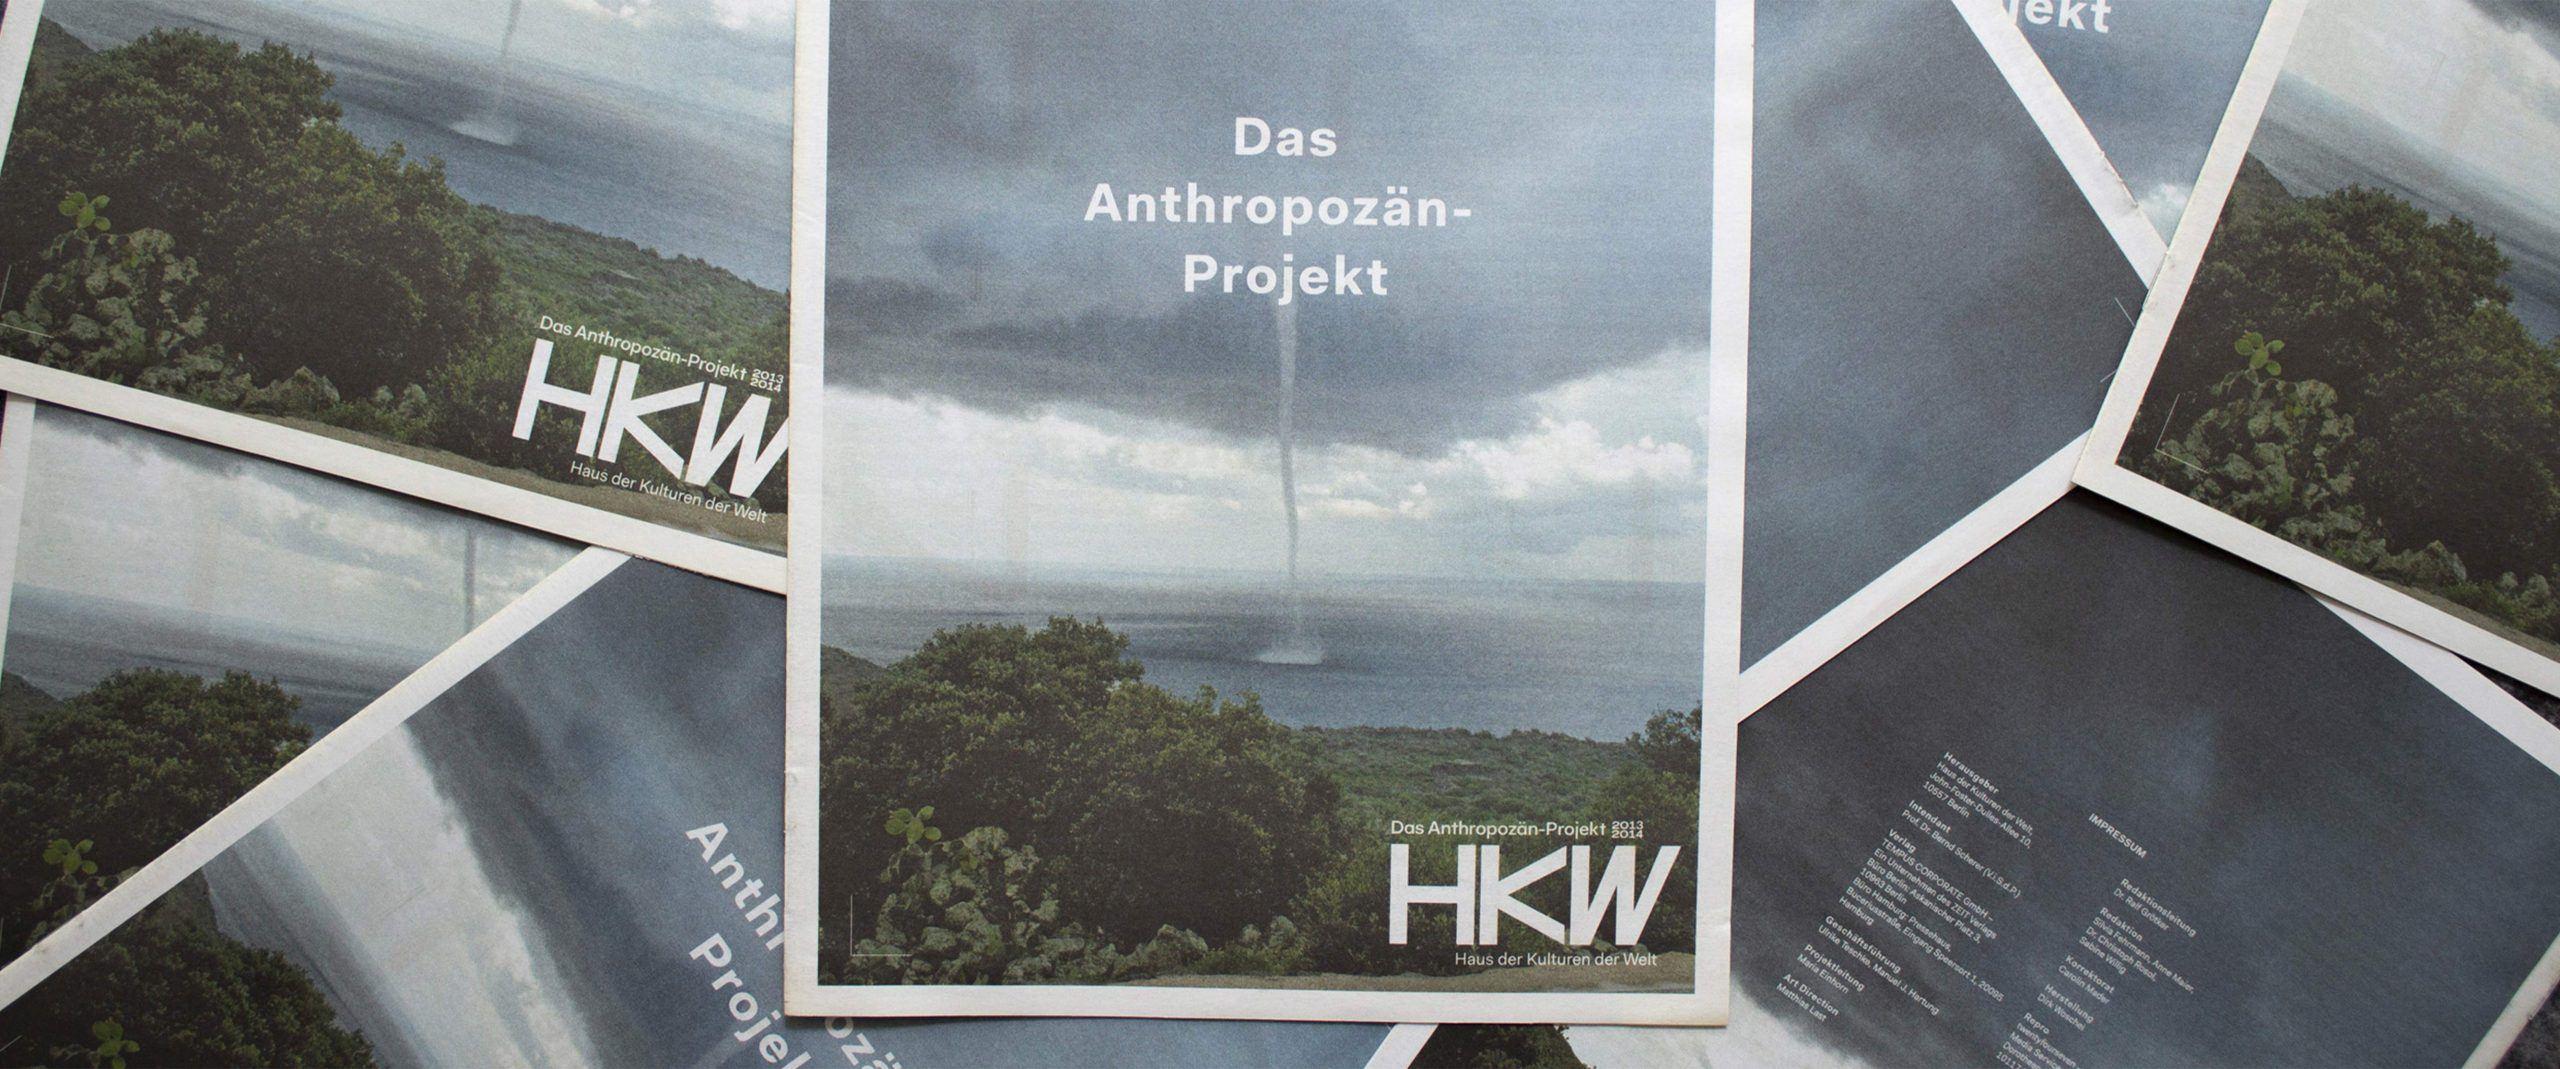 Studio Last - HKW Anthropozän-Projekt – Supplement